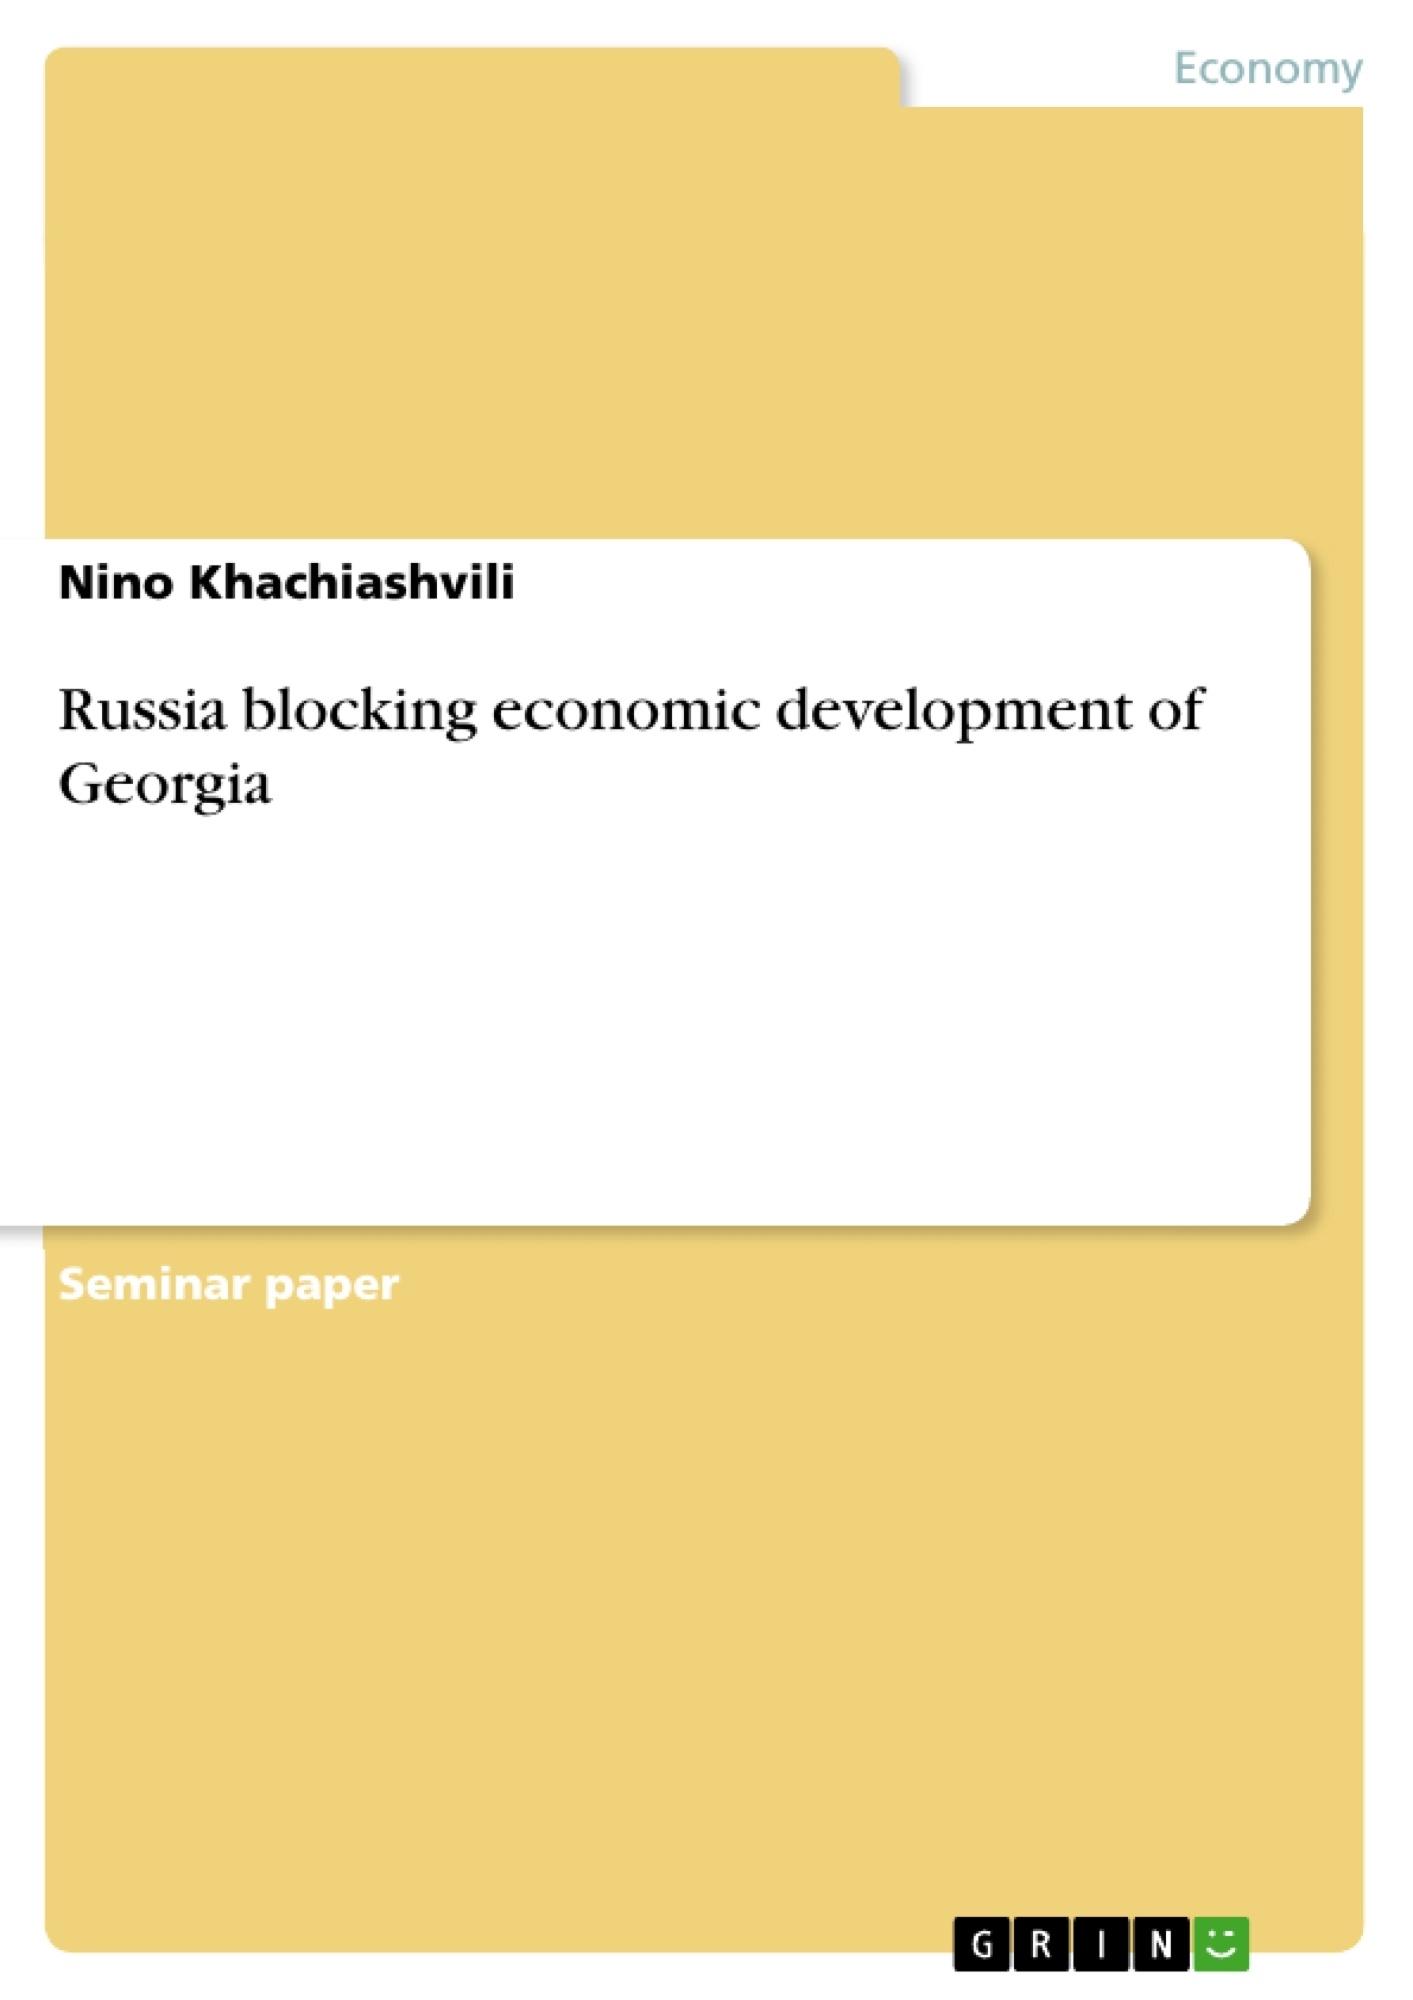 Title: Russia blocking economic development of Georgia